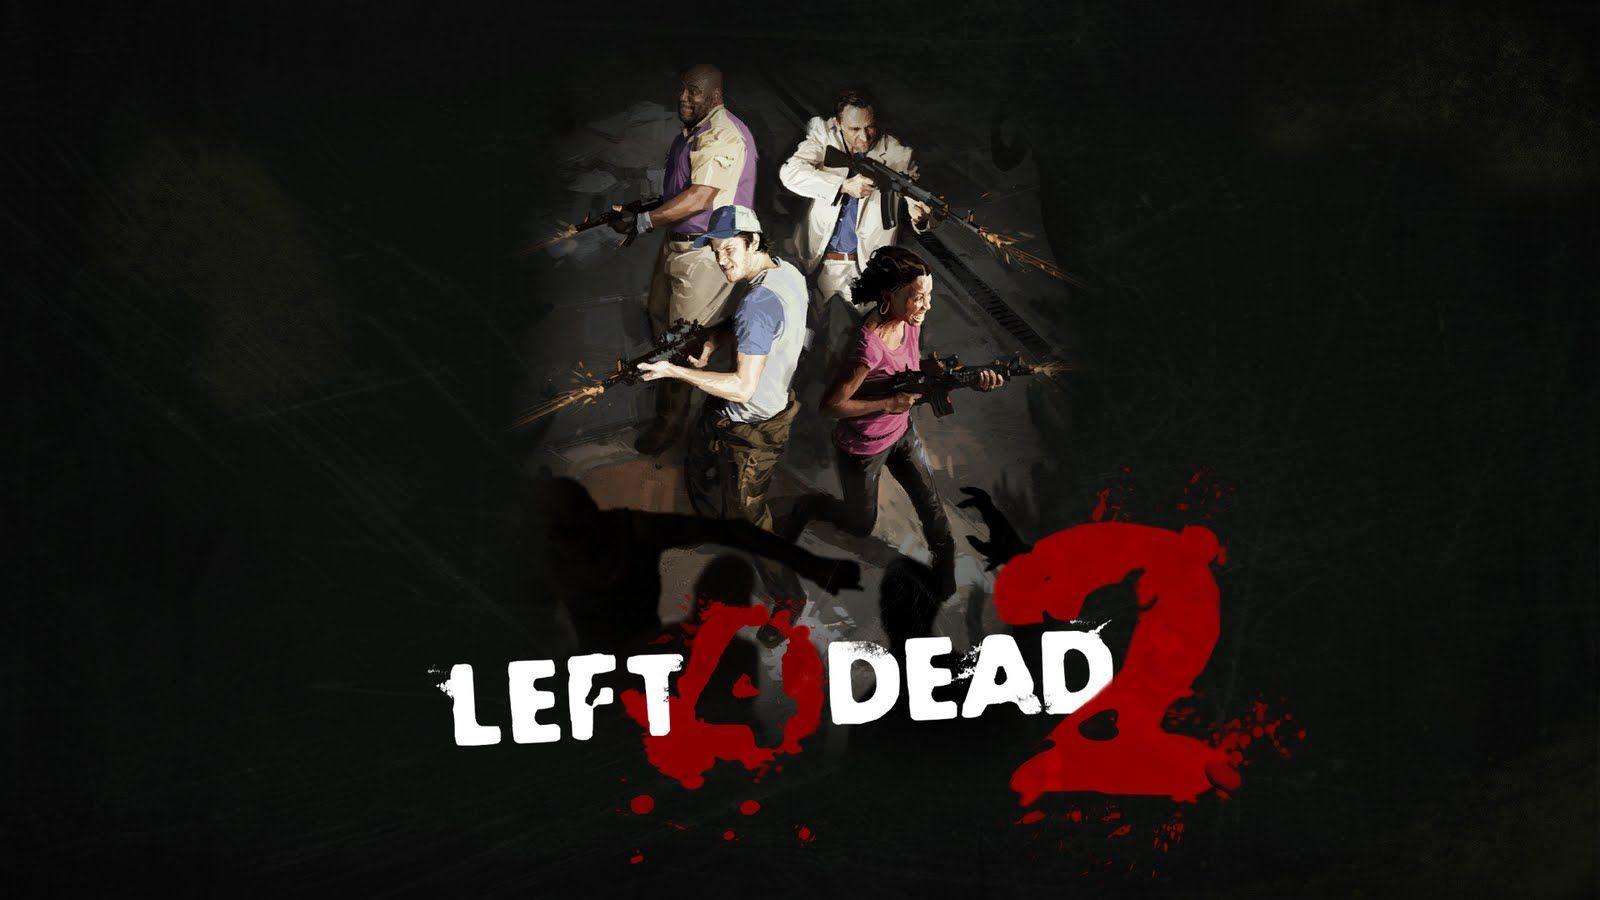 Left 4 Dead 2 Wallpapers Top Free Left 4 Dead 2 Backgrounds